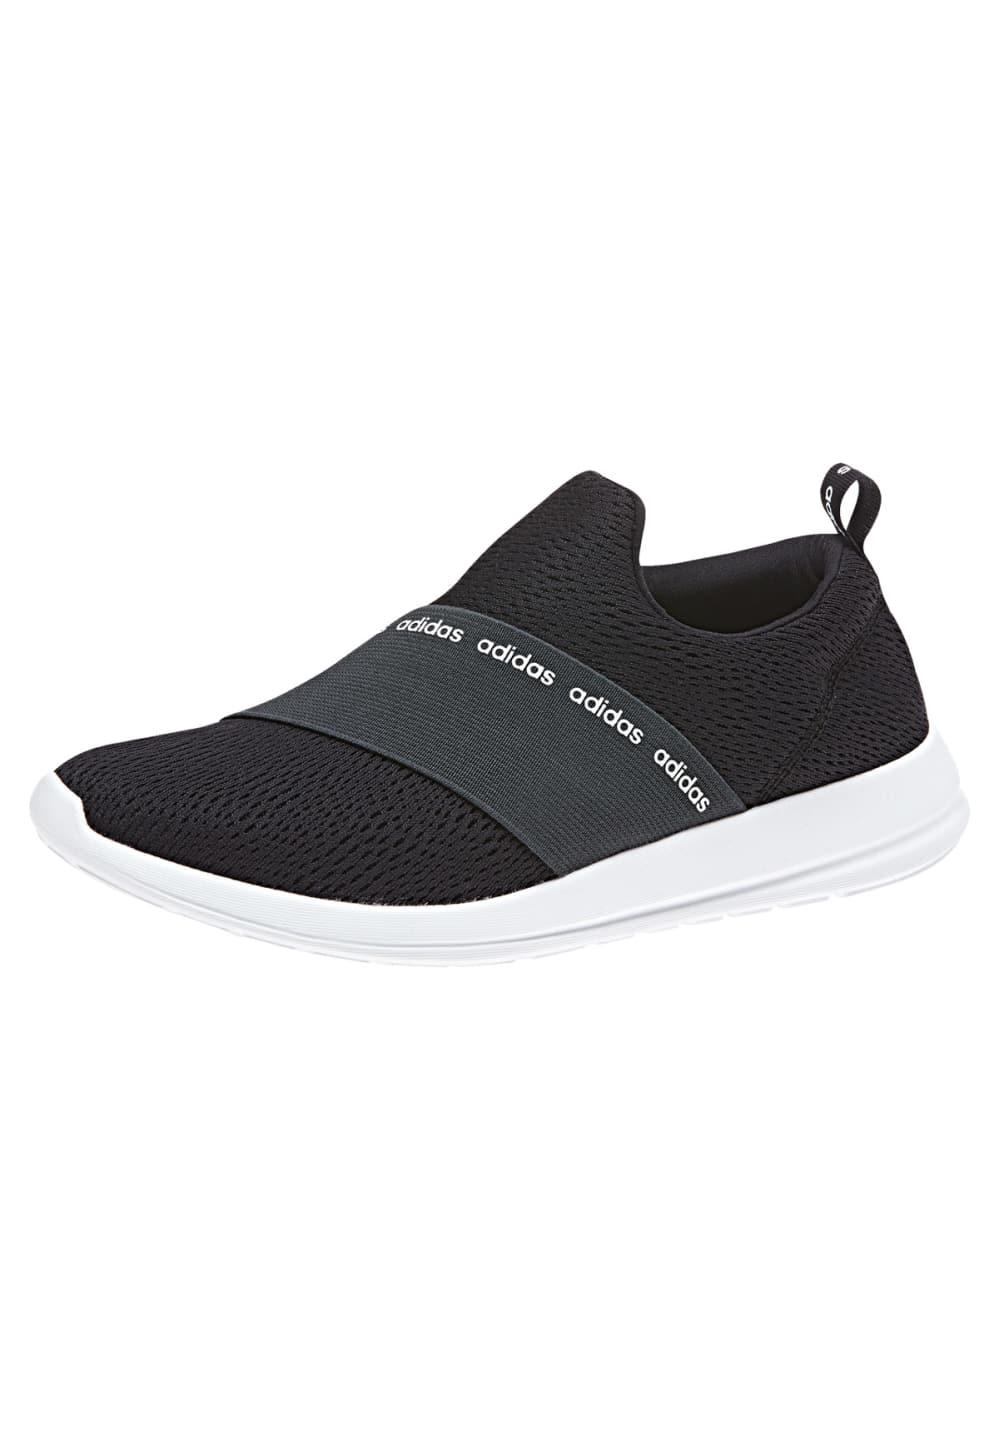 Neo Adidas Noir Femme Pour Refine Chaussures Cf Running Adapt 8v0mNwn